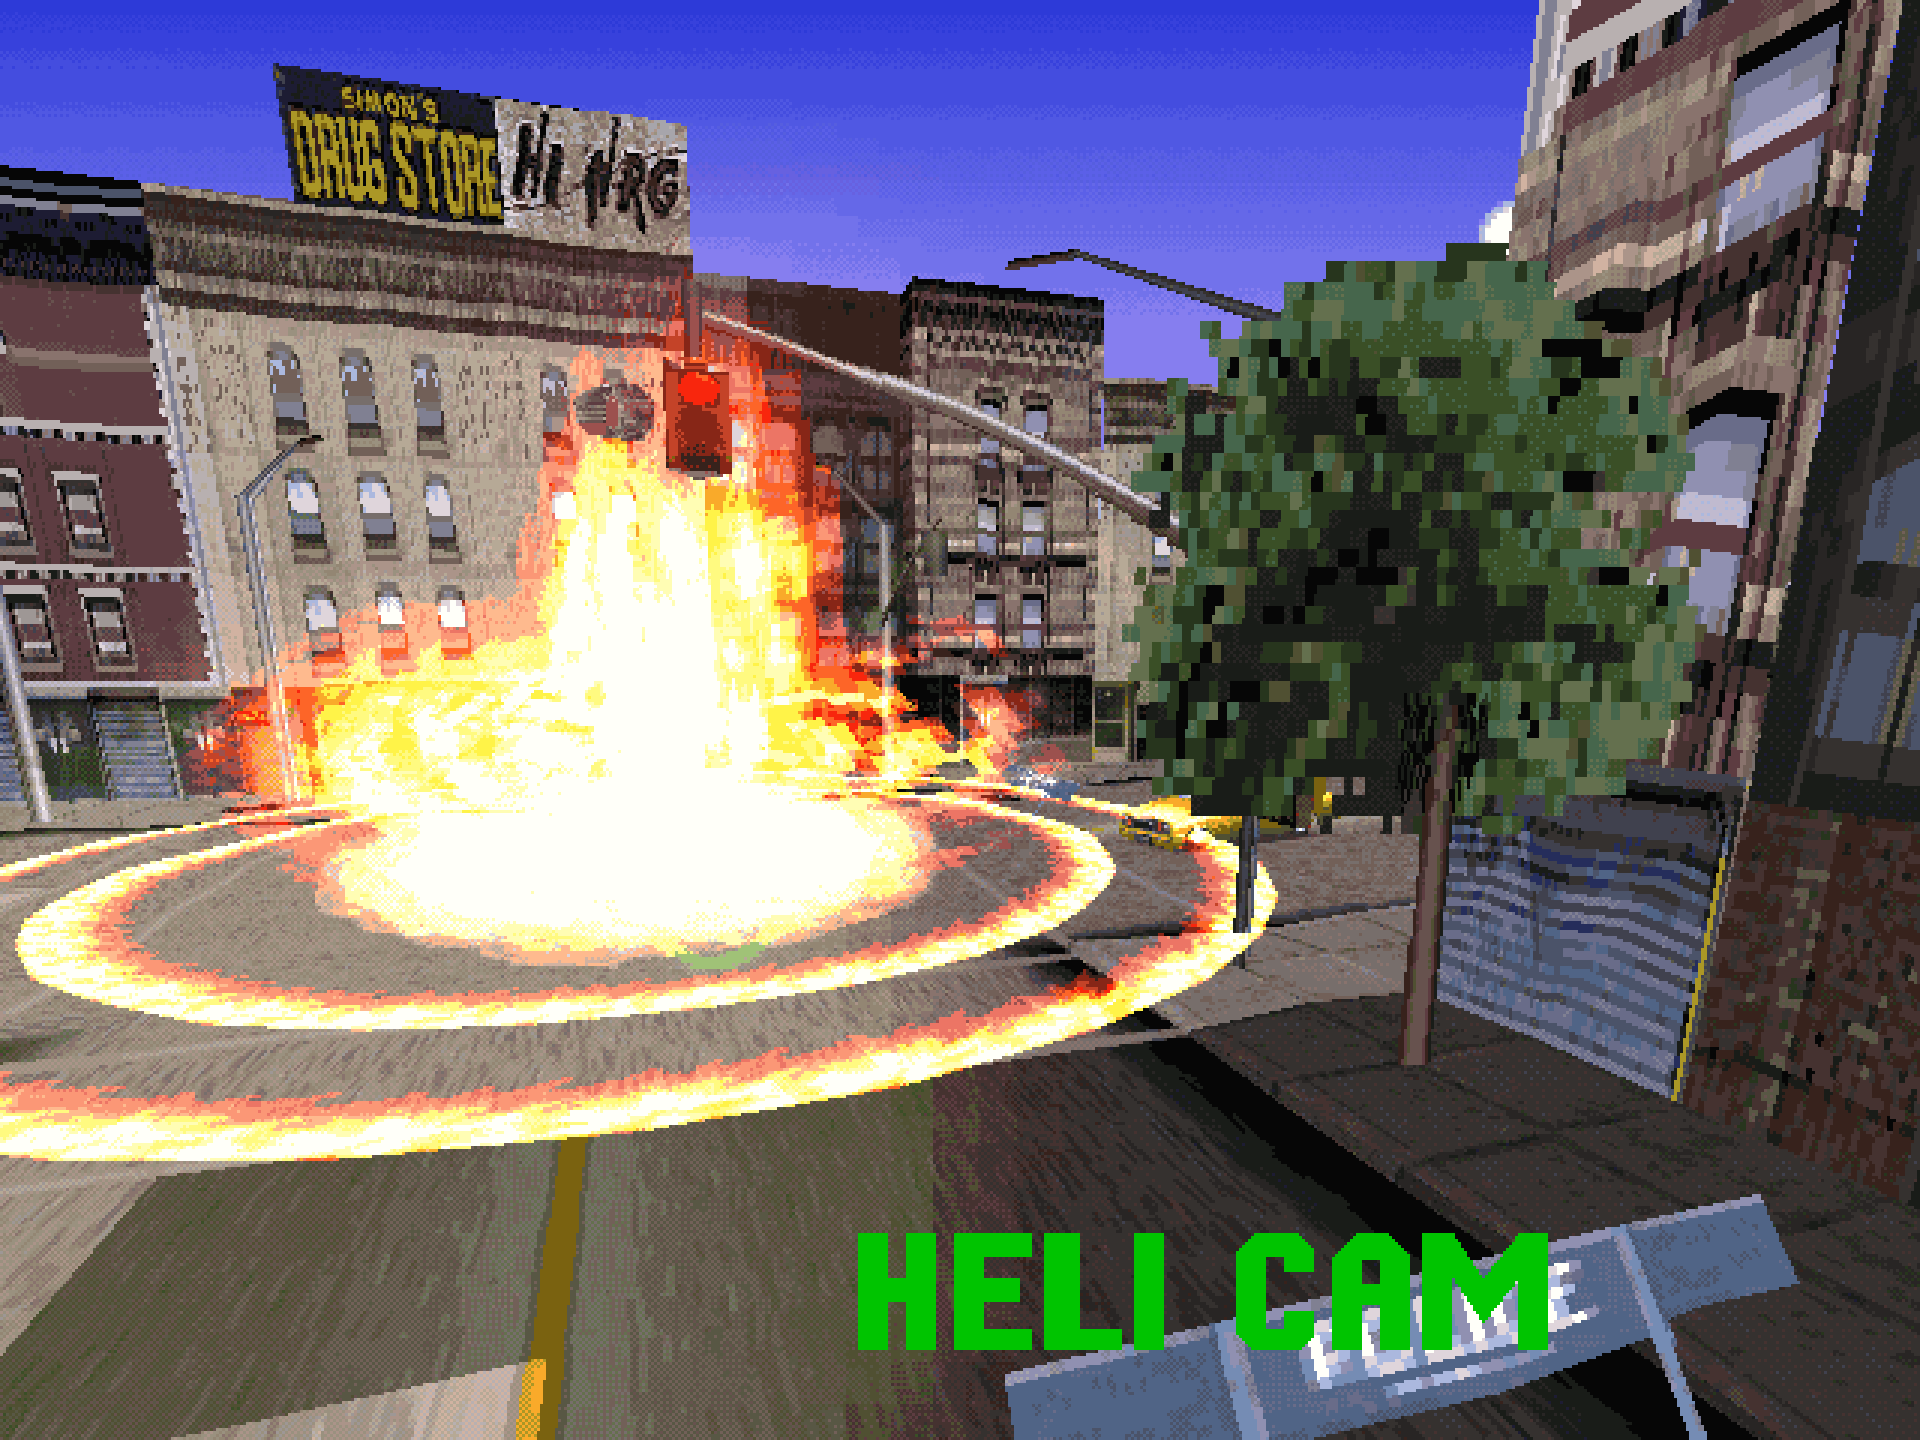 A bomb detonation in New York City in Die Hard Trilogy.